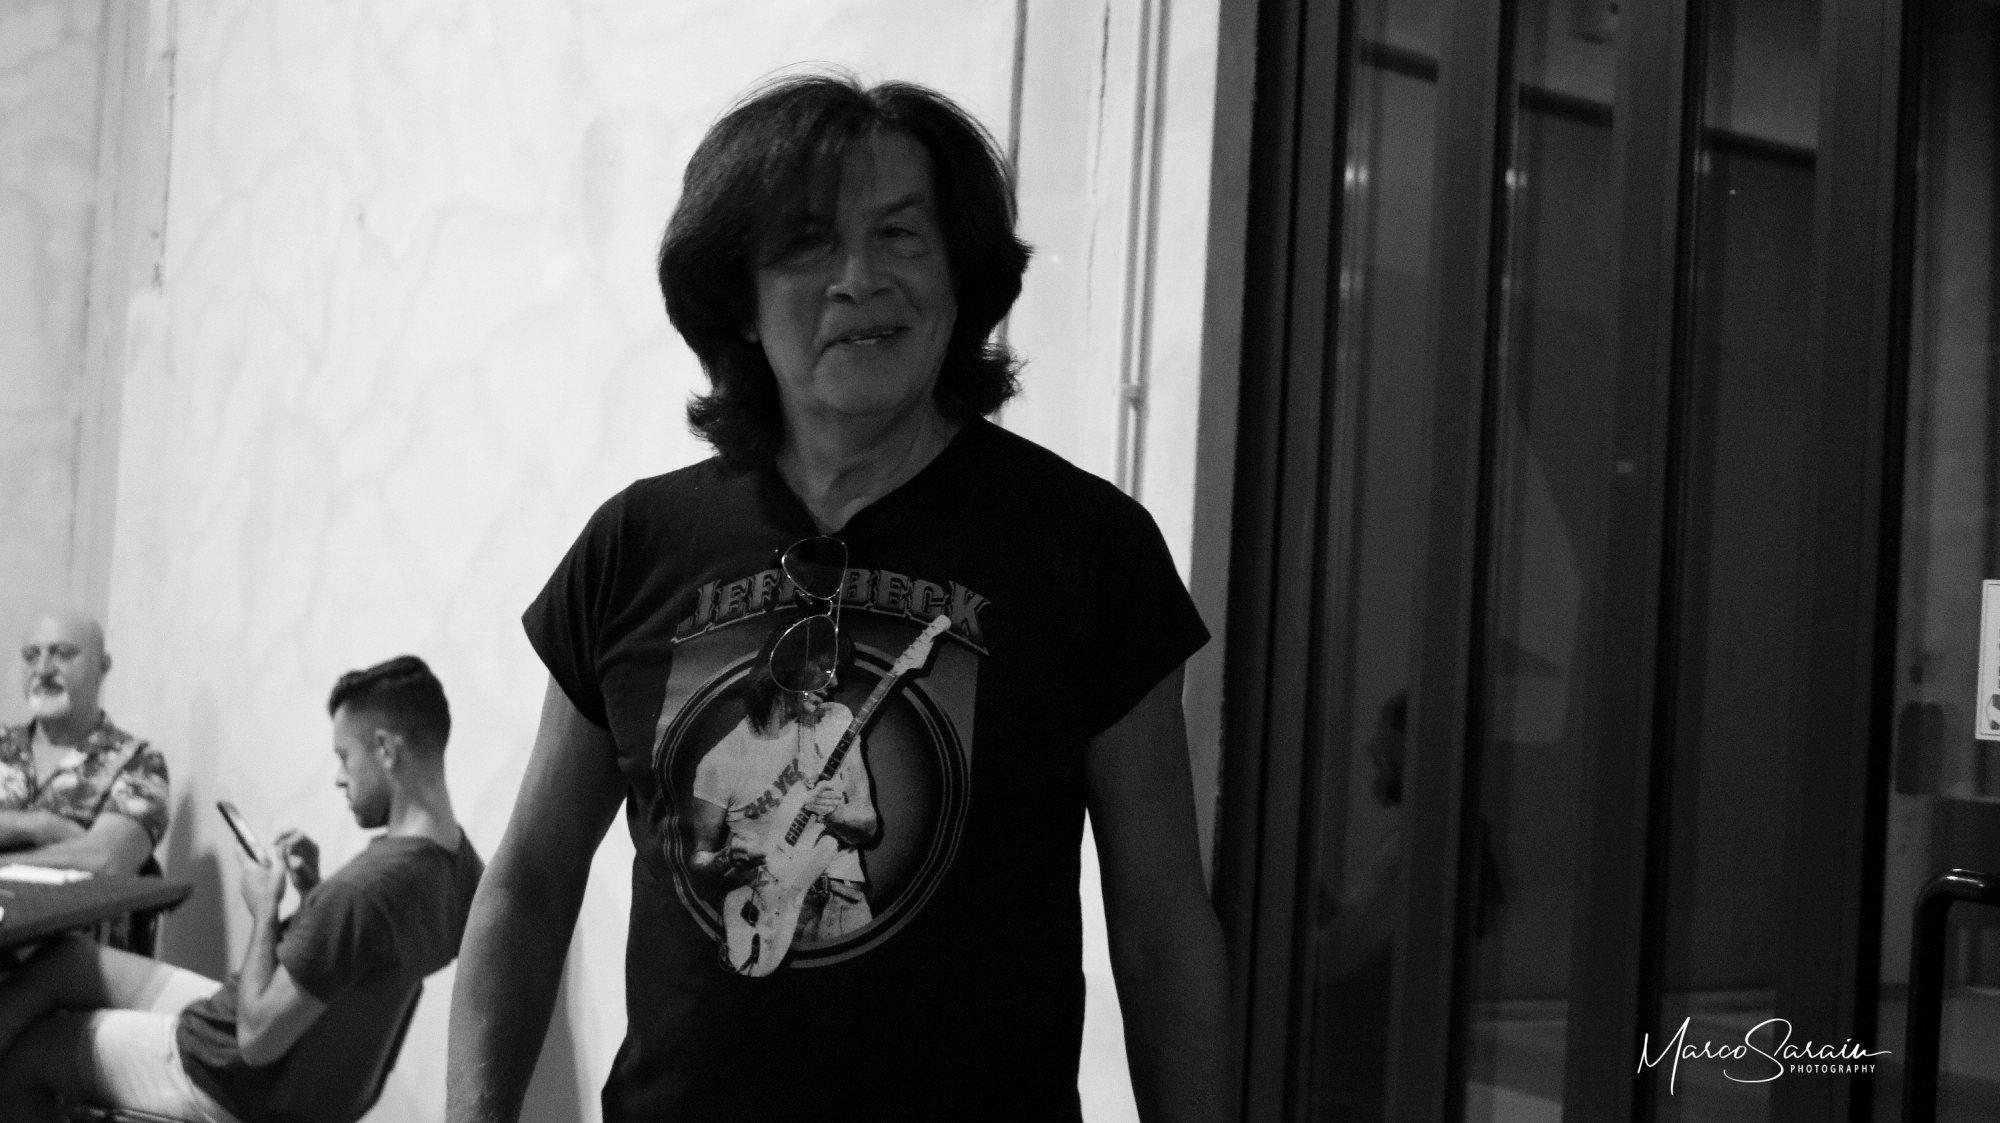 Vasco History Band - Godega di S.Urbano #BACKSTAGE